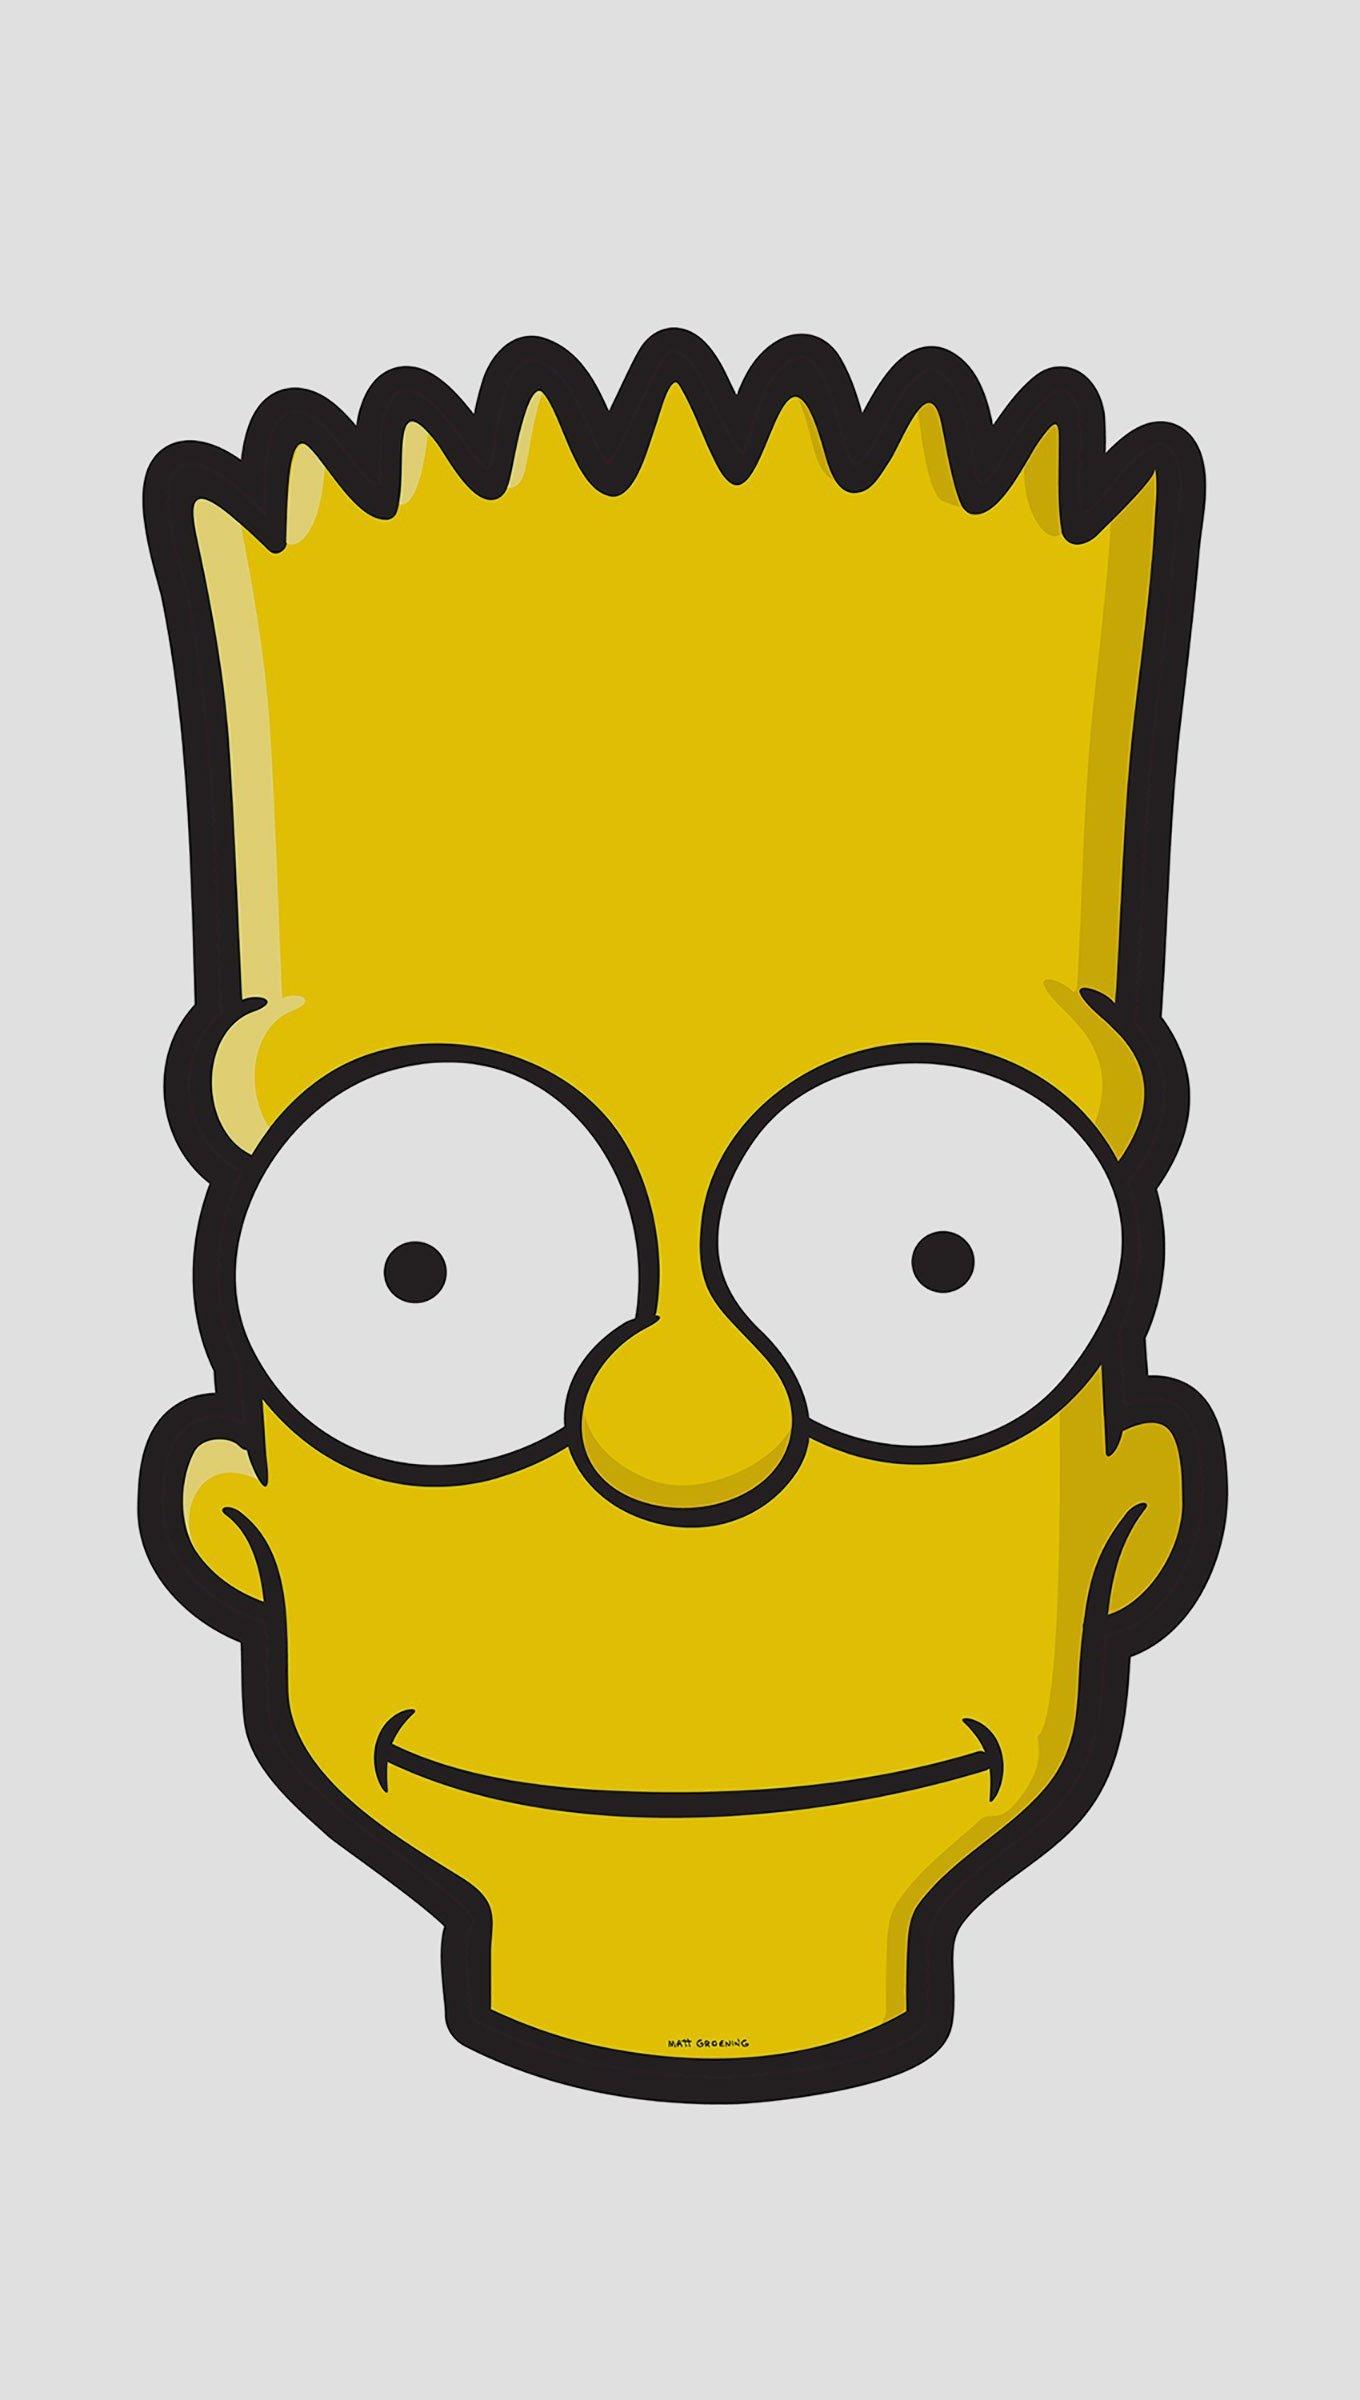 Fondos de pantalla Bart Simpson Minimalista Vertical